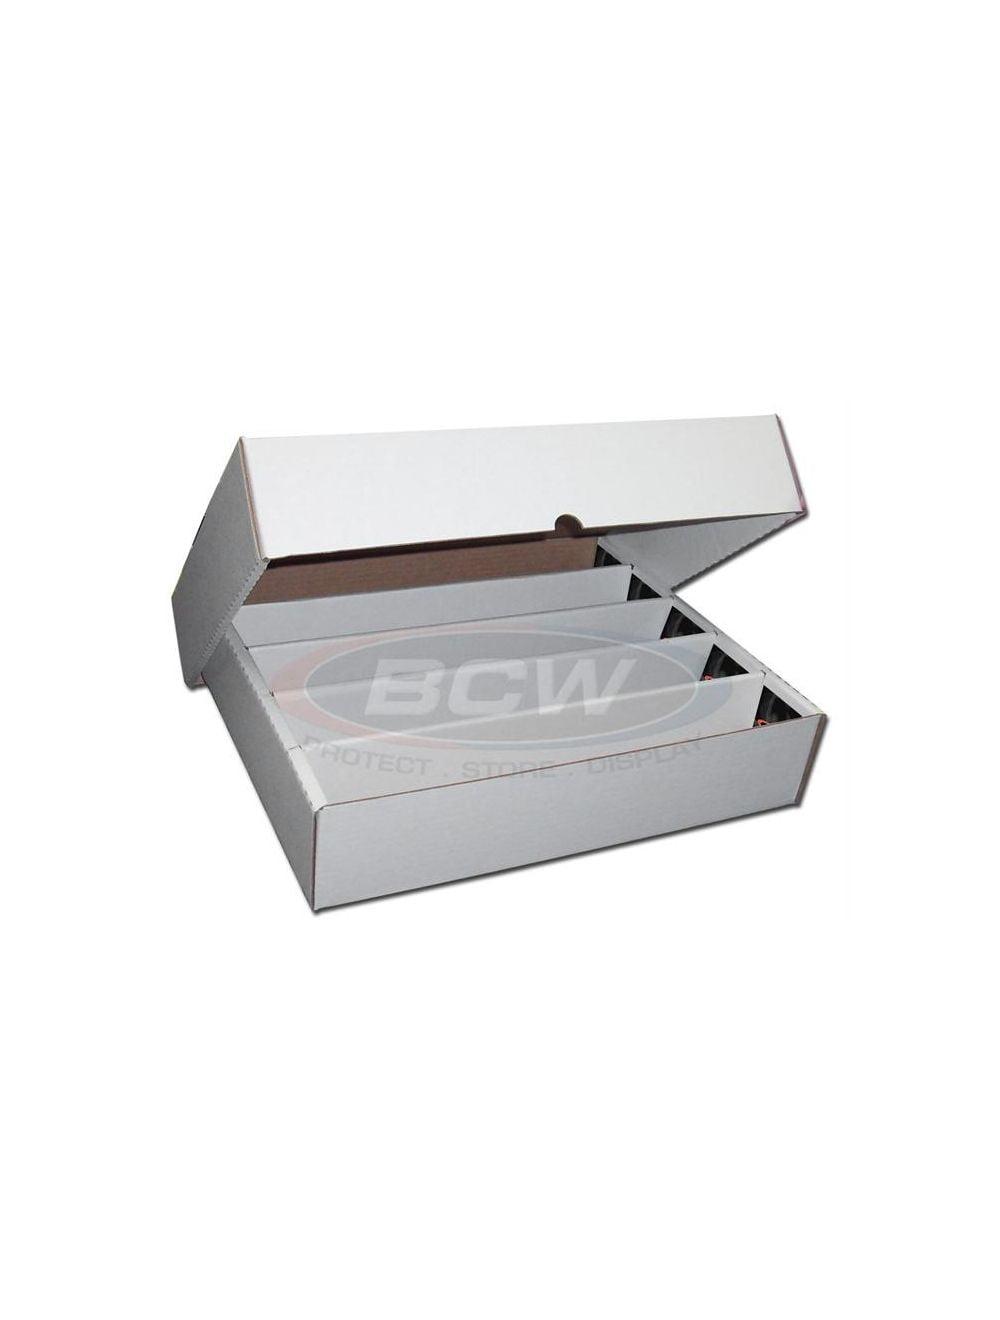 5000 Count Storage Box (Full Lid)